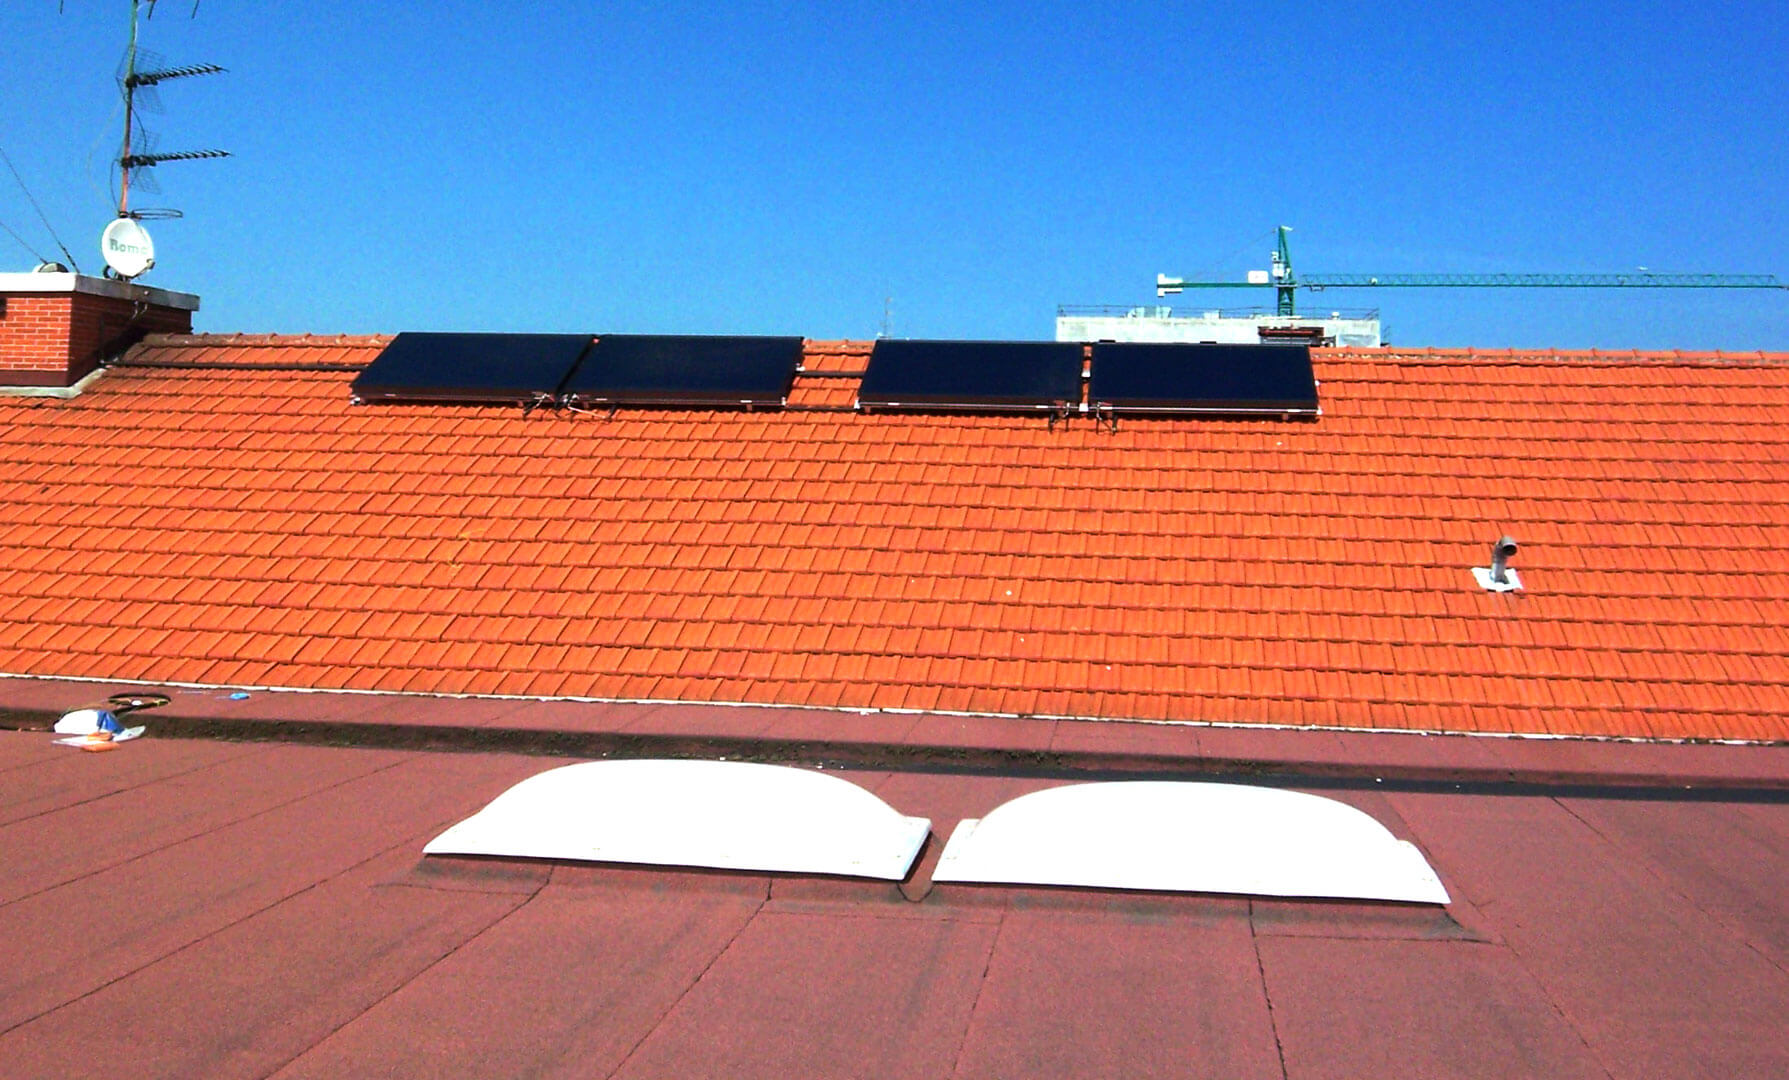 installation solaire thermique ville - installation-solaire-thermique-ville -